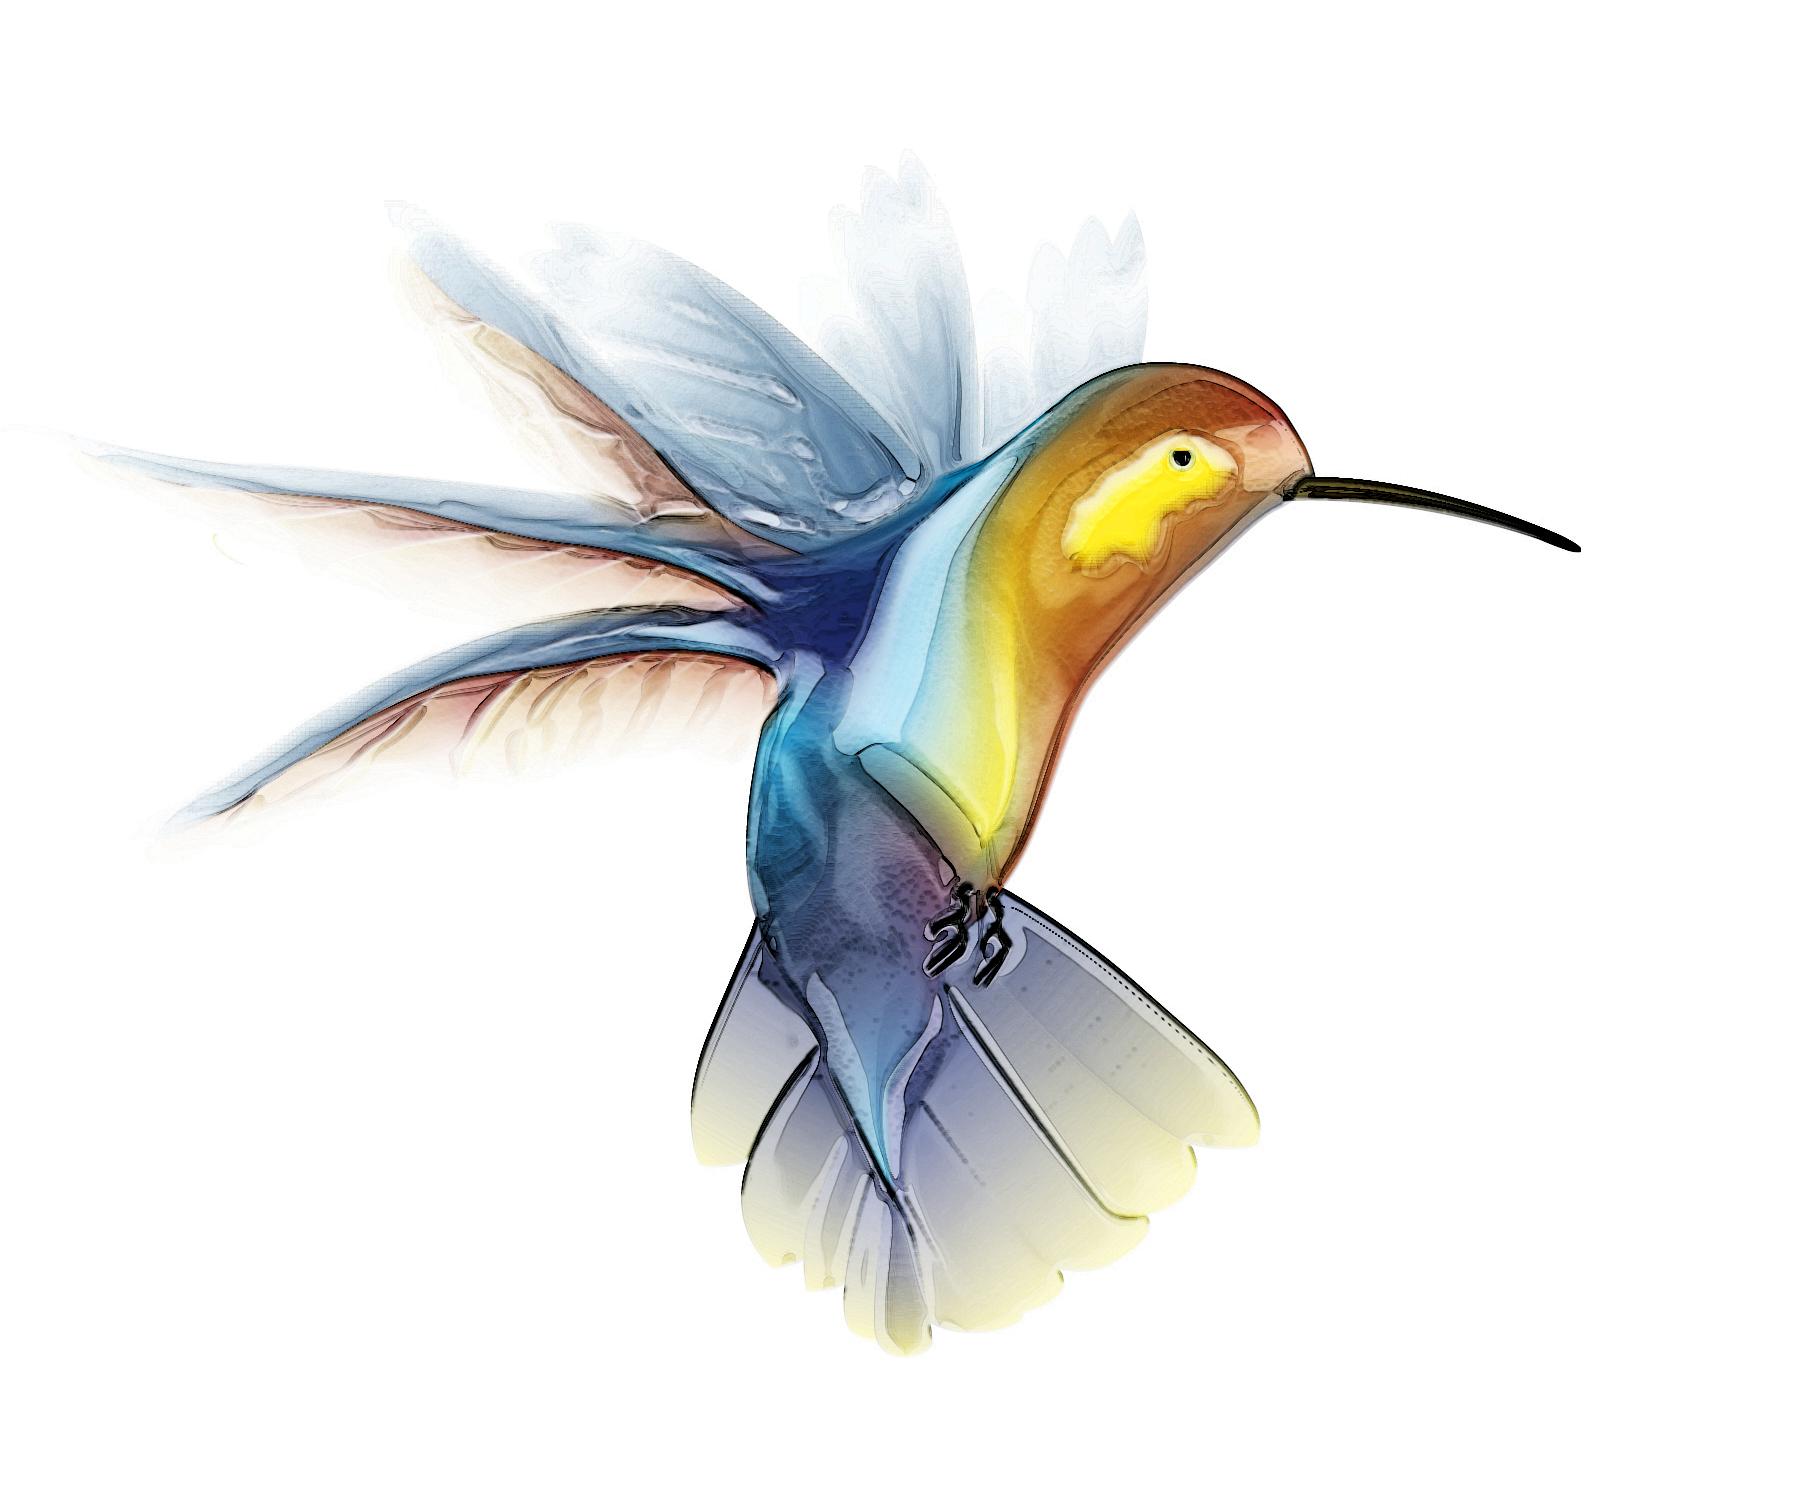 Free cliparts download clip. Hummingbird clipart real